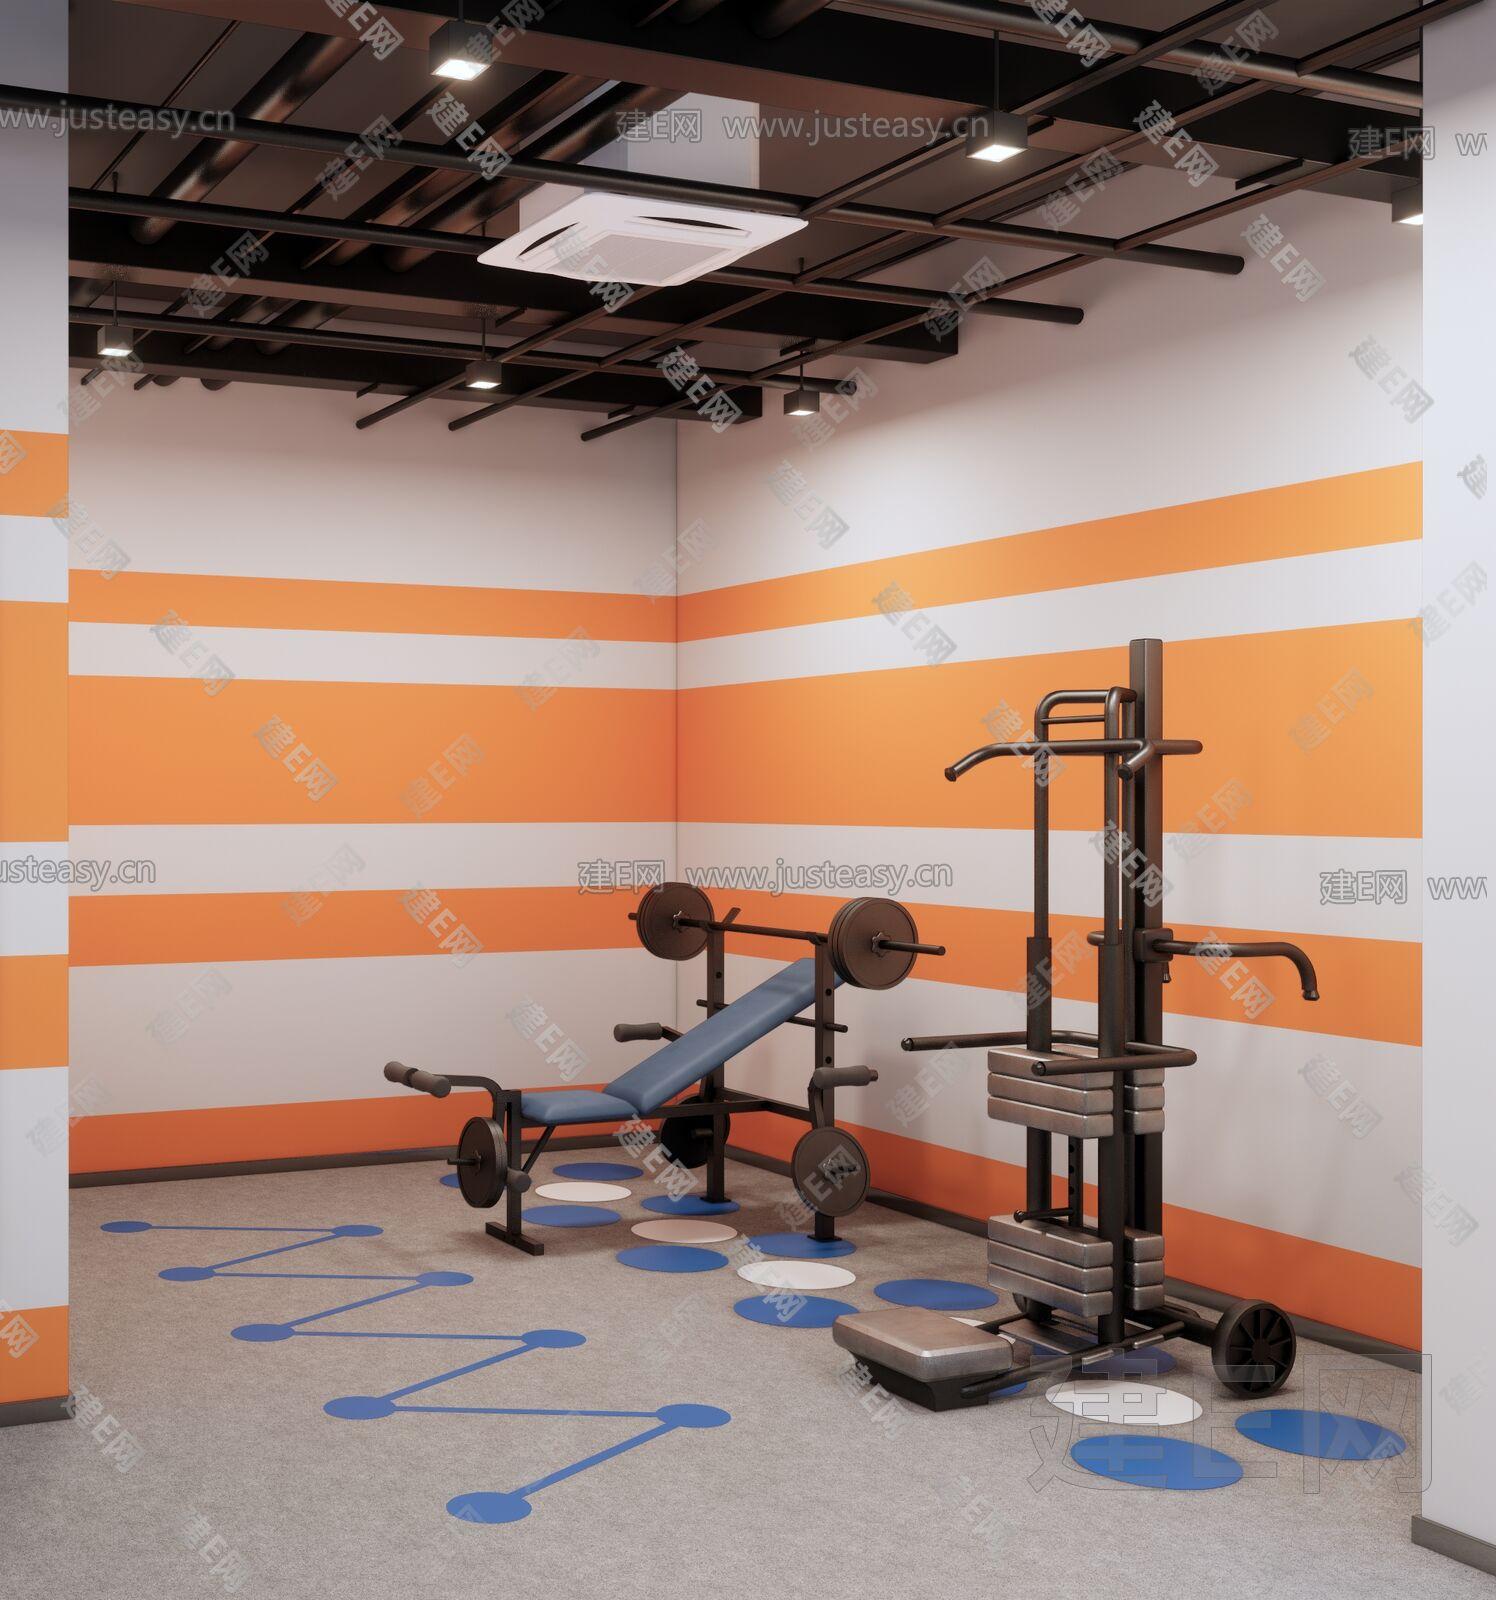 现代健身器材 sketchup模型